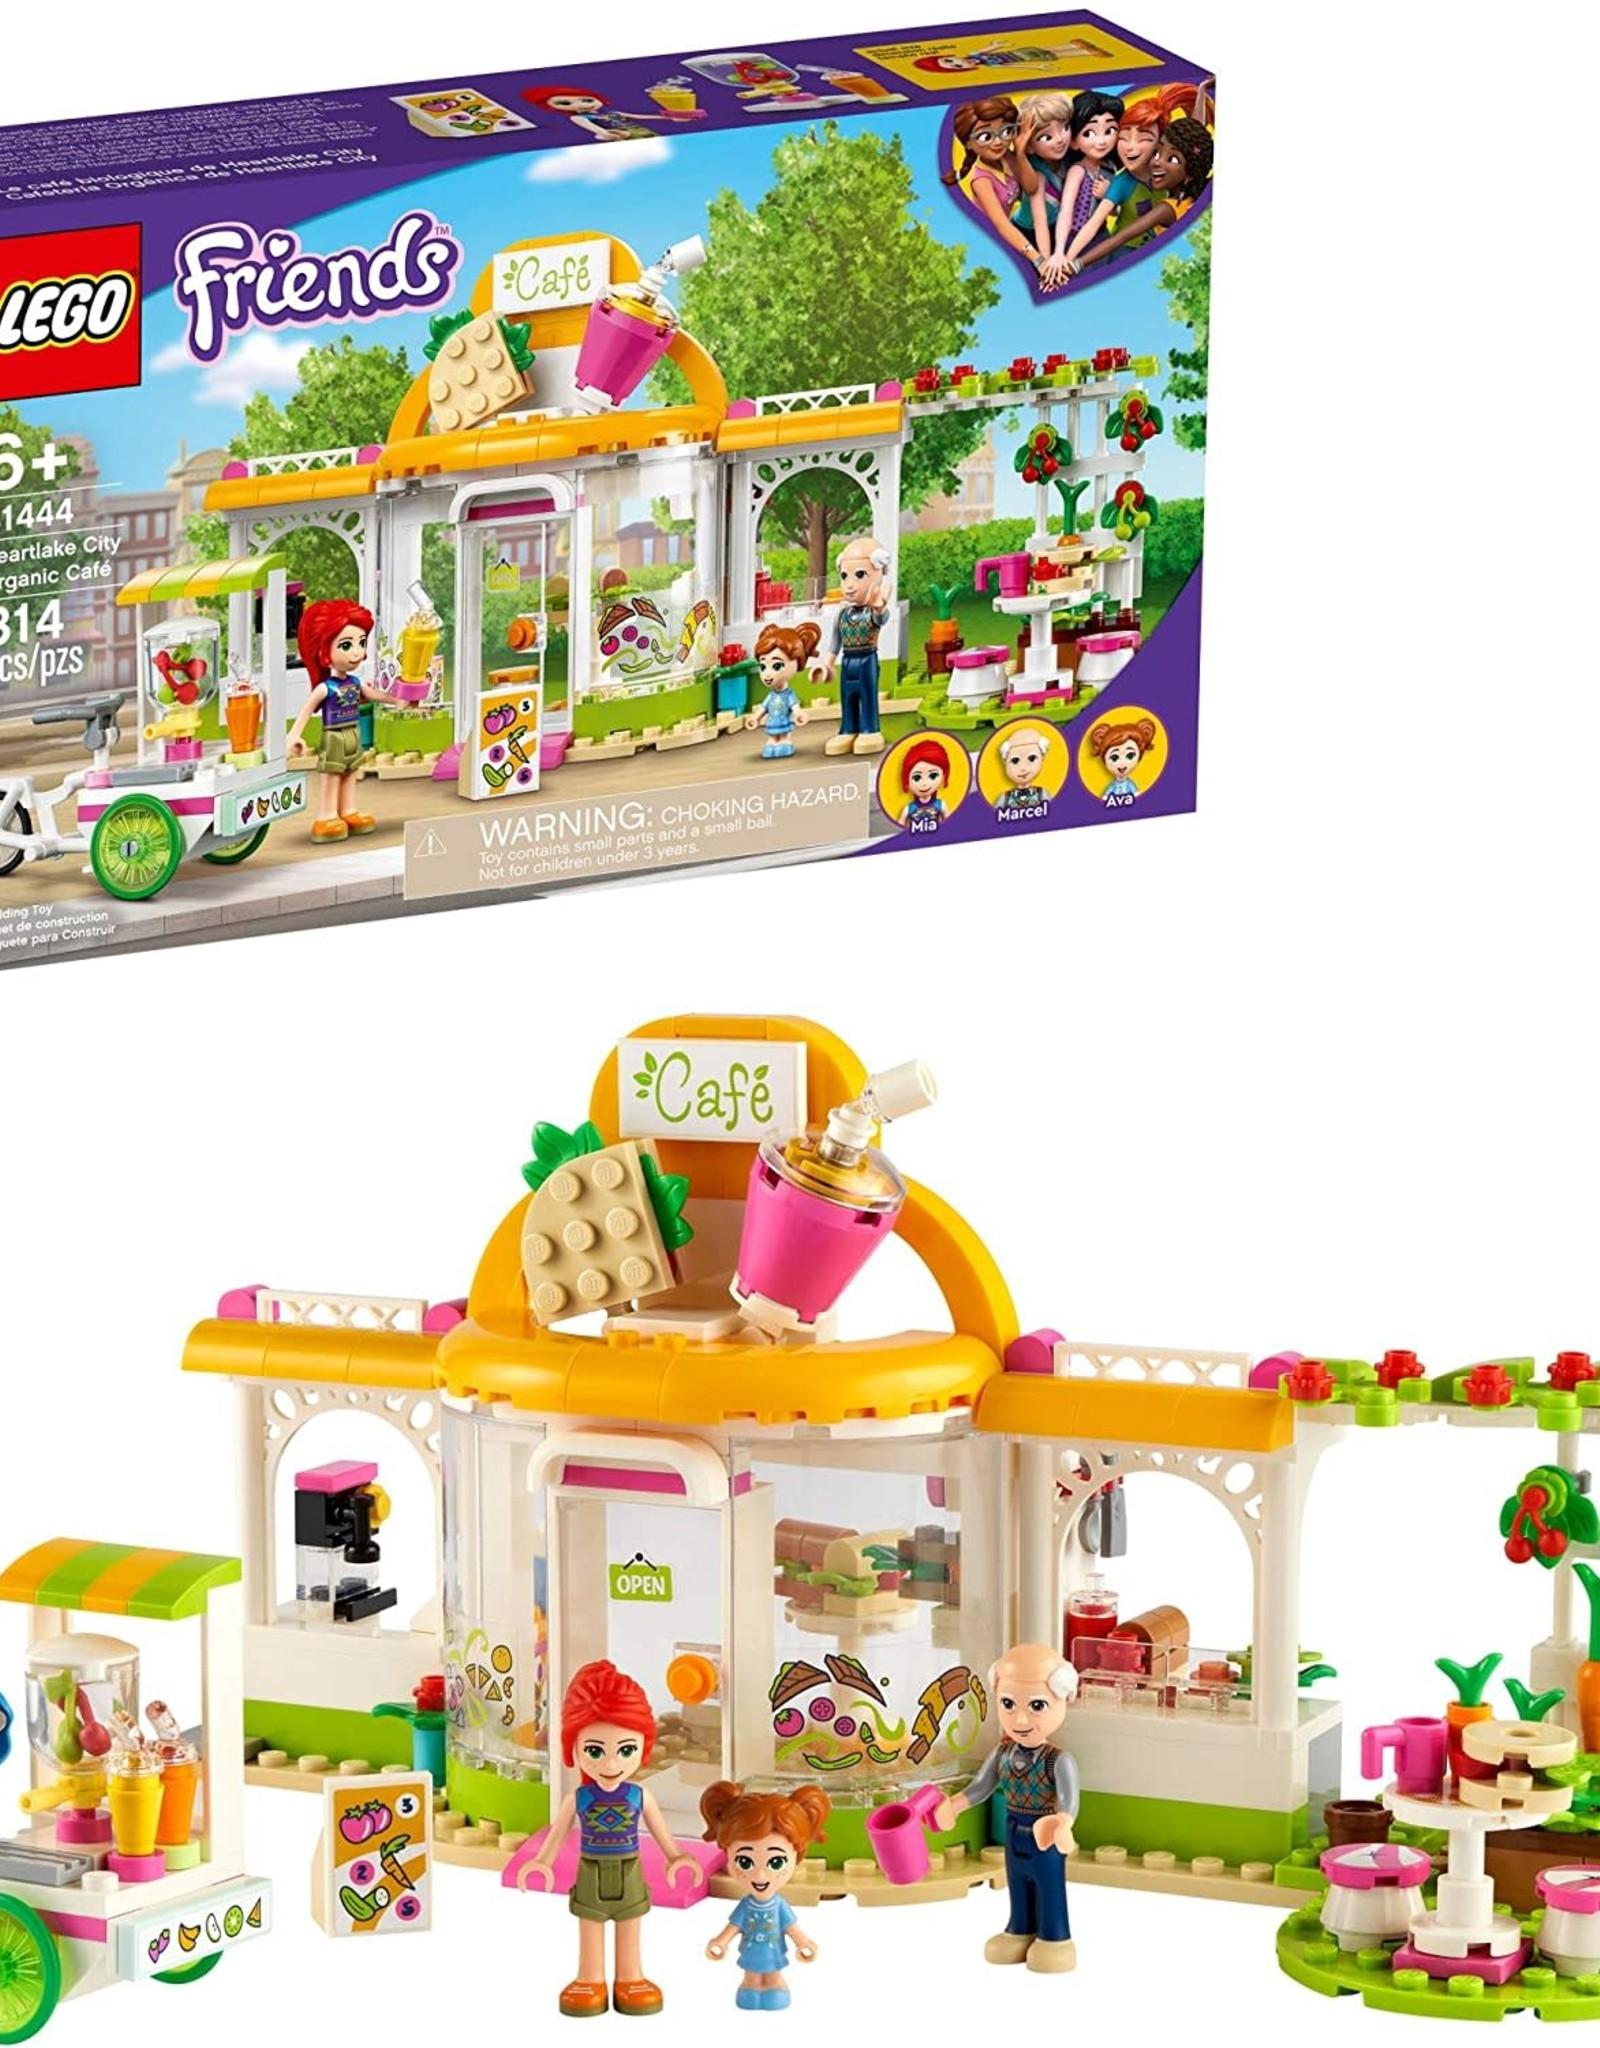 LEGO LEGO Friends Heartlake City Organic Café